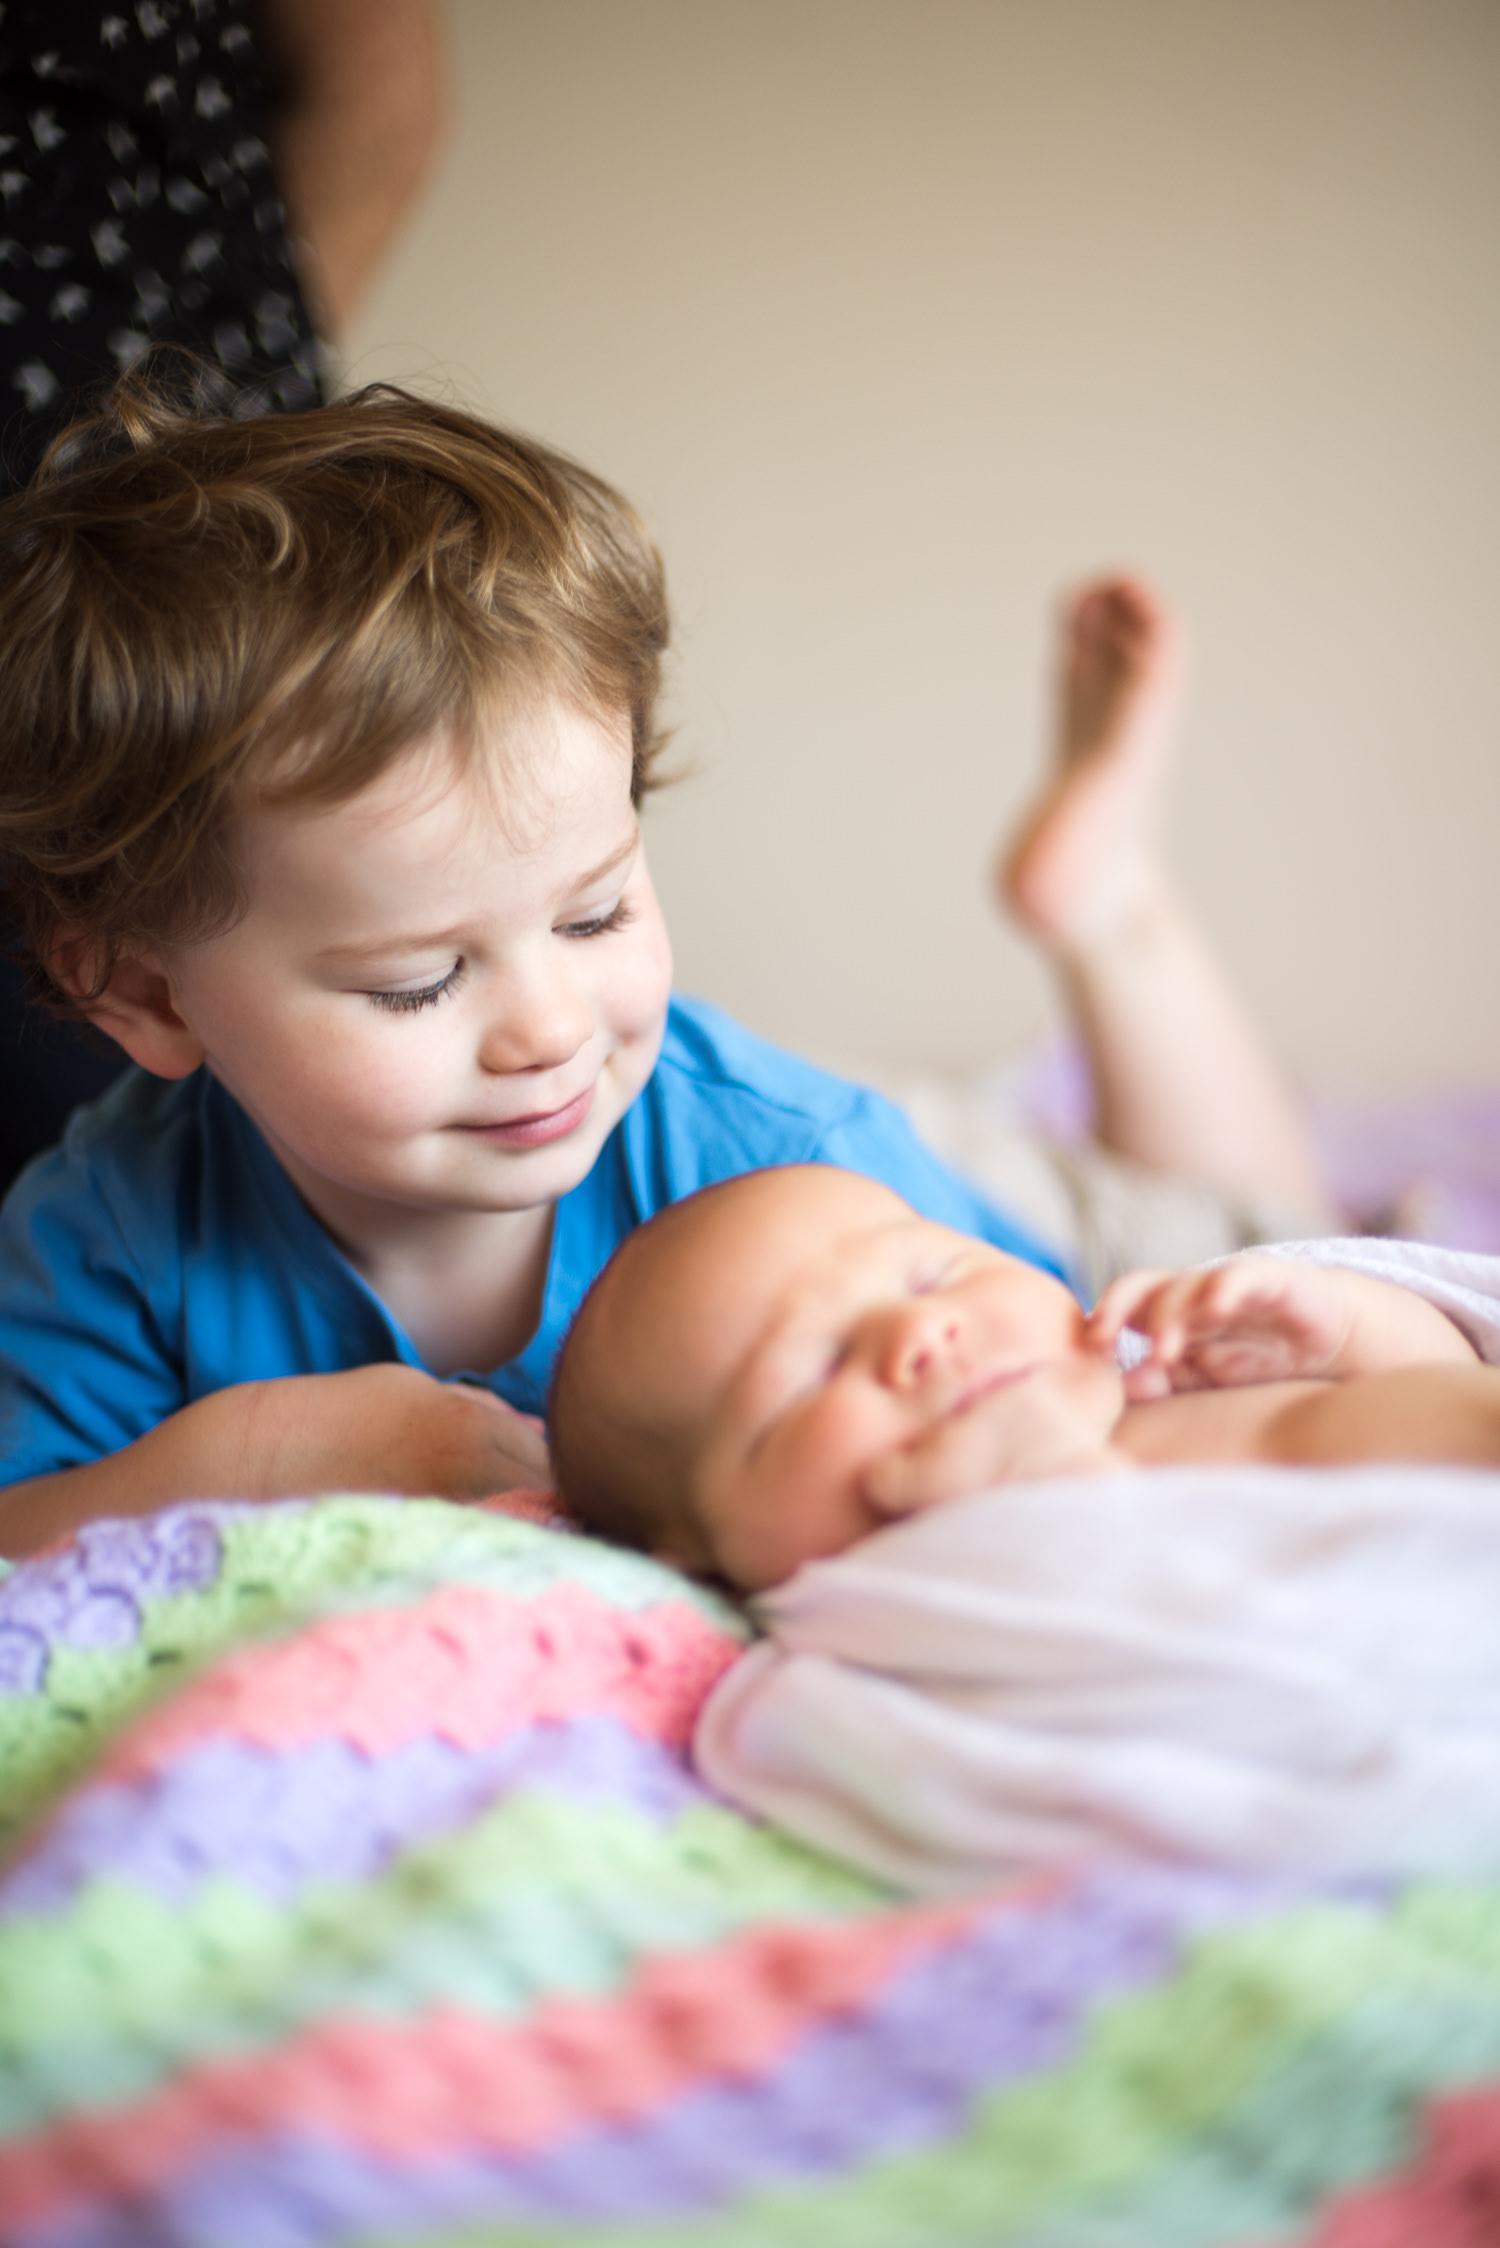 Portland-Family-Baby-Sibling-Photography-004.jpg